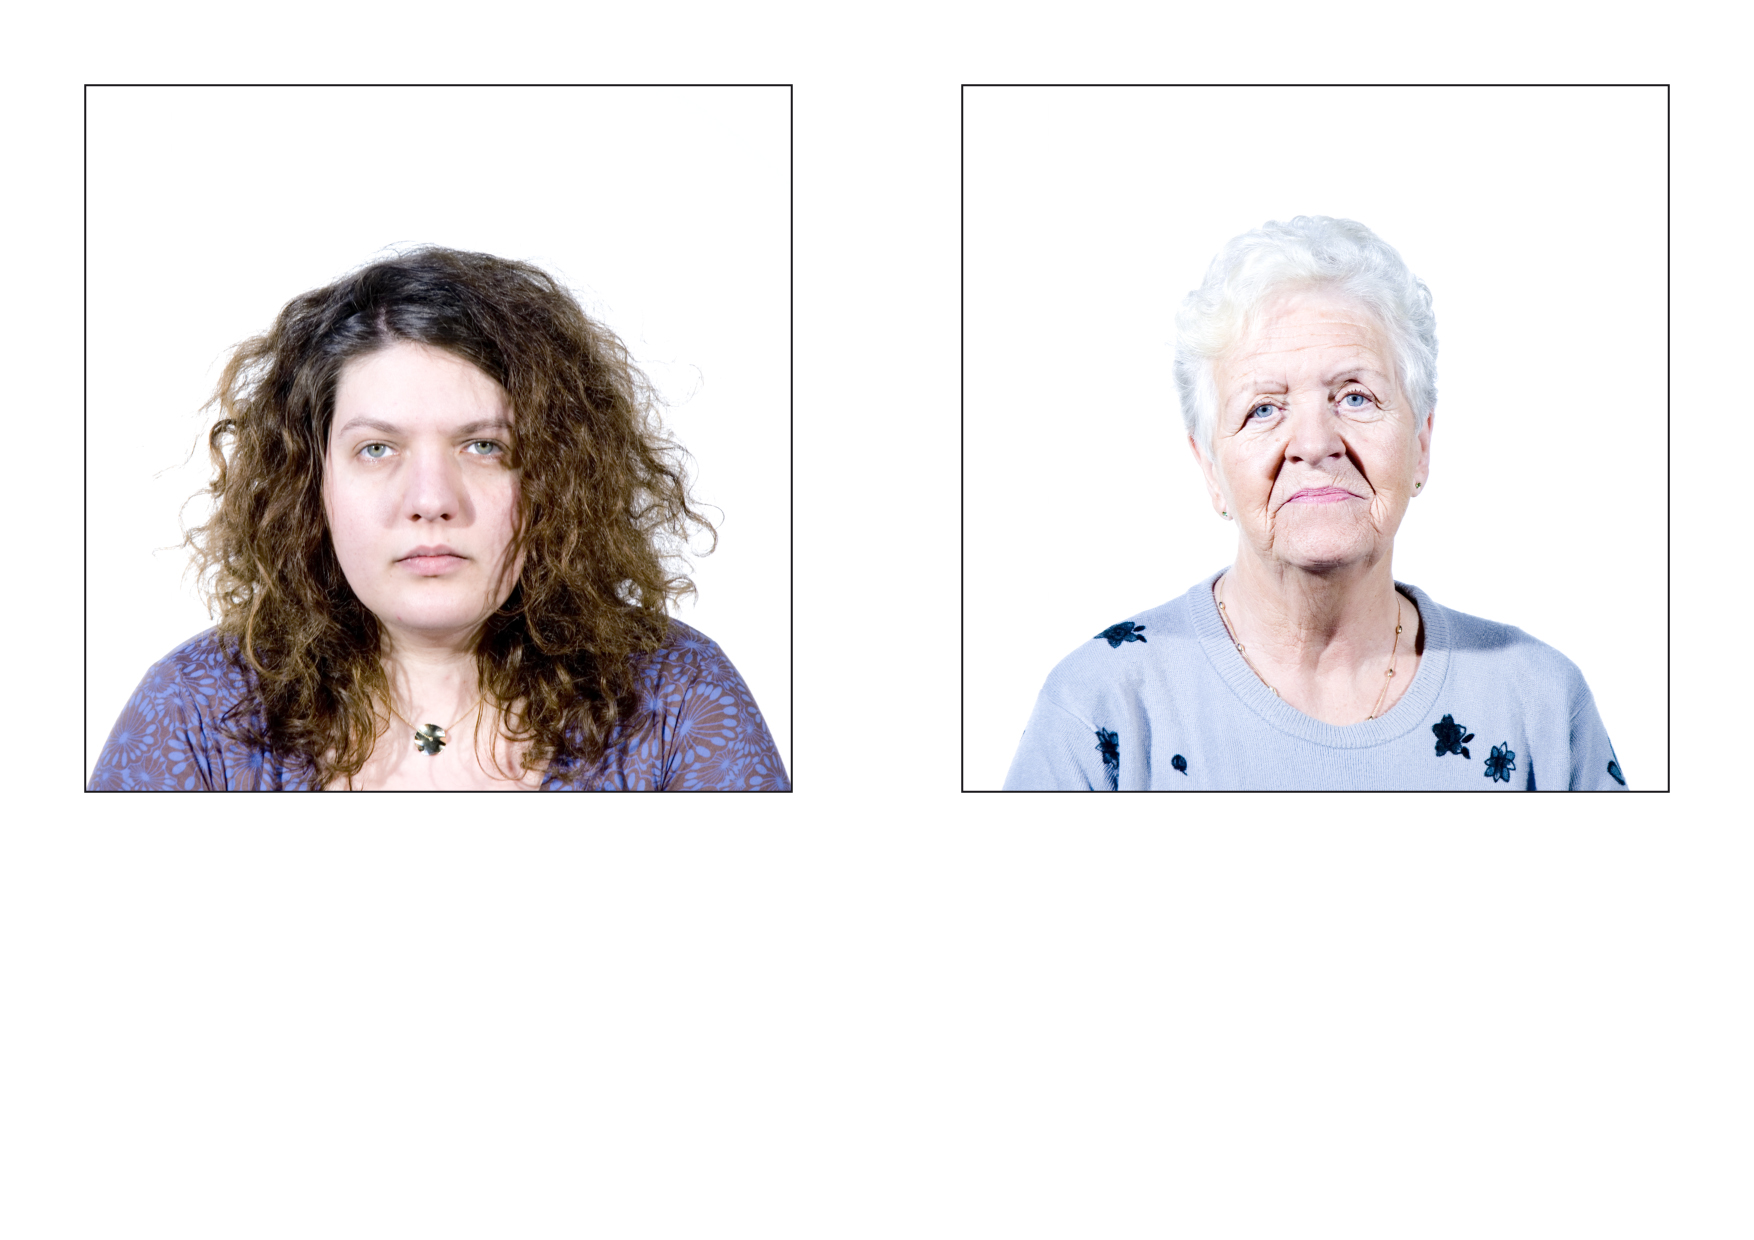 portraits-2-p4-5.jpg